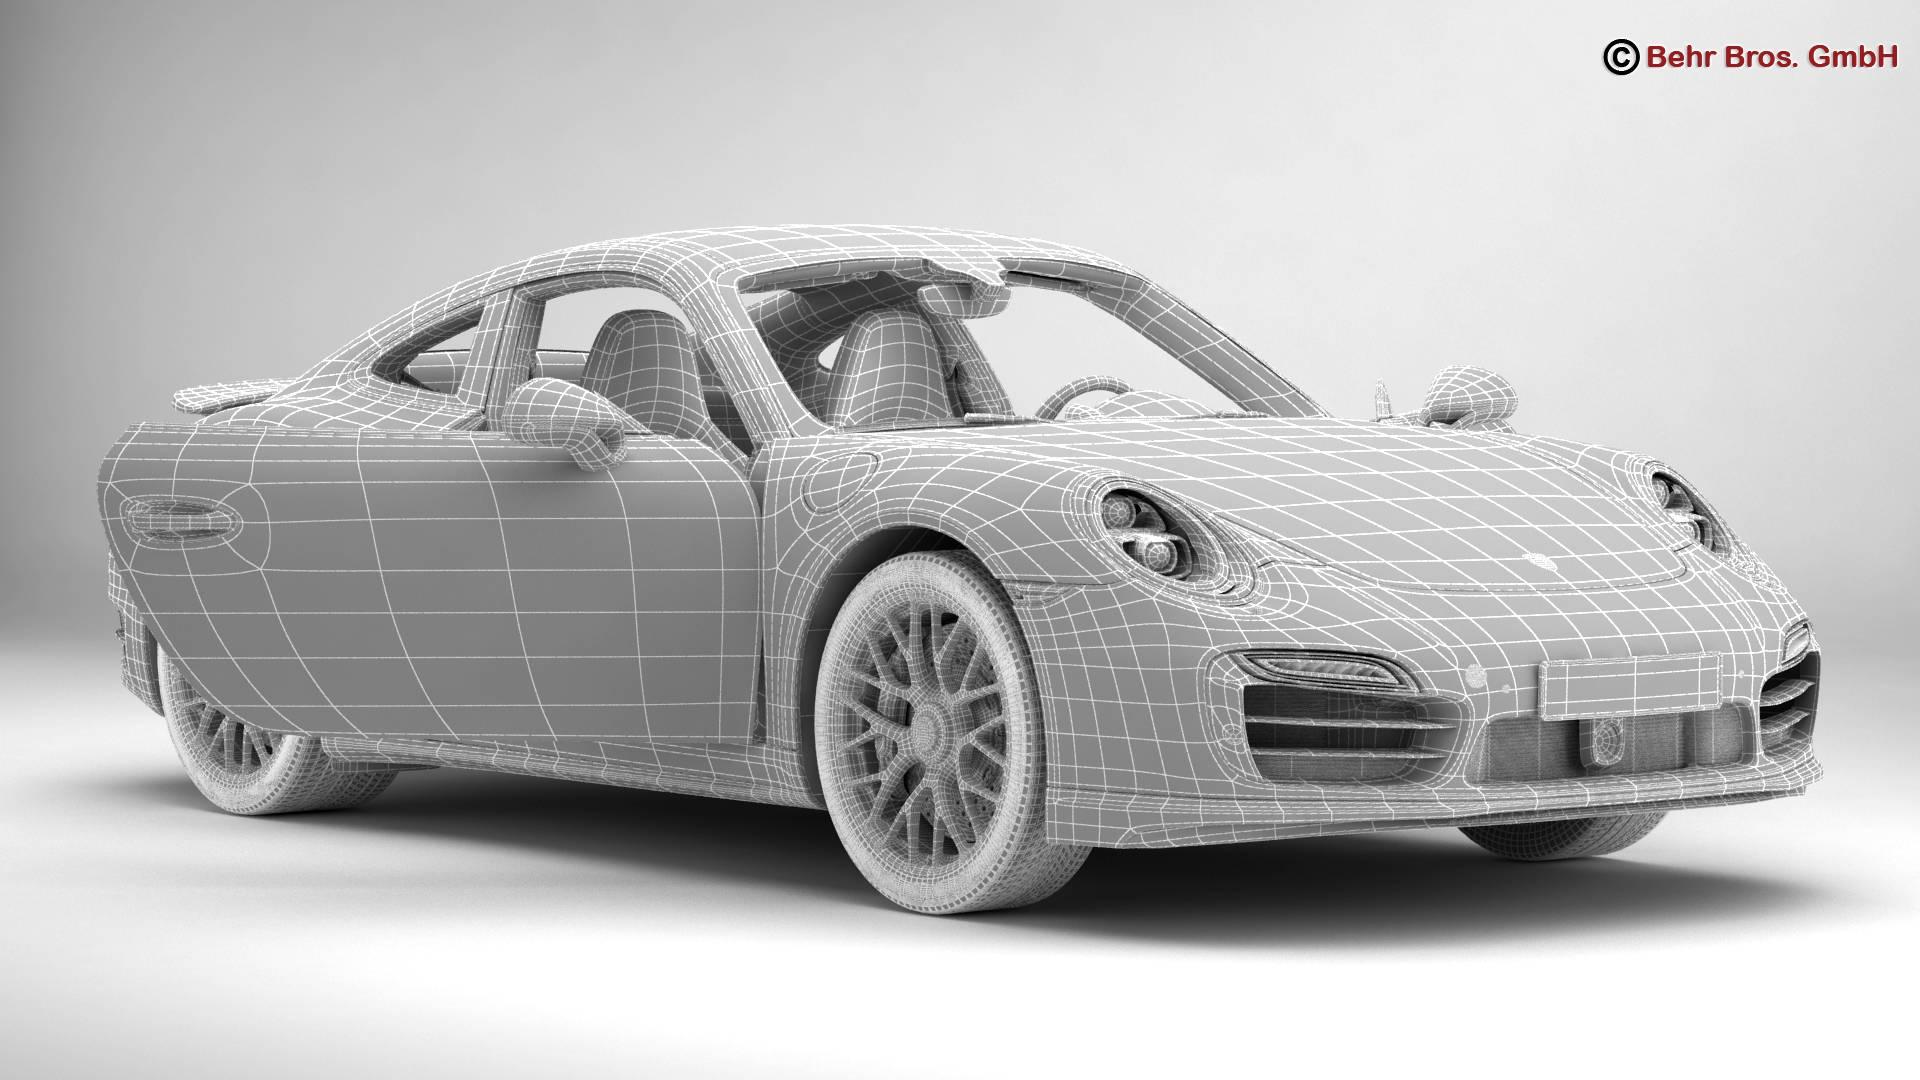 porsche 911 turbo s 2014 3d model 3ds max fbx c4d lwo ma mb obj 212492